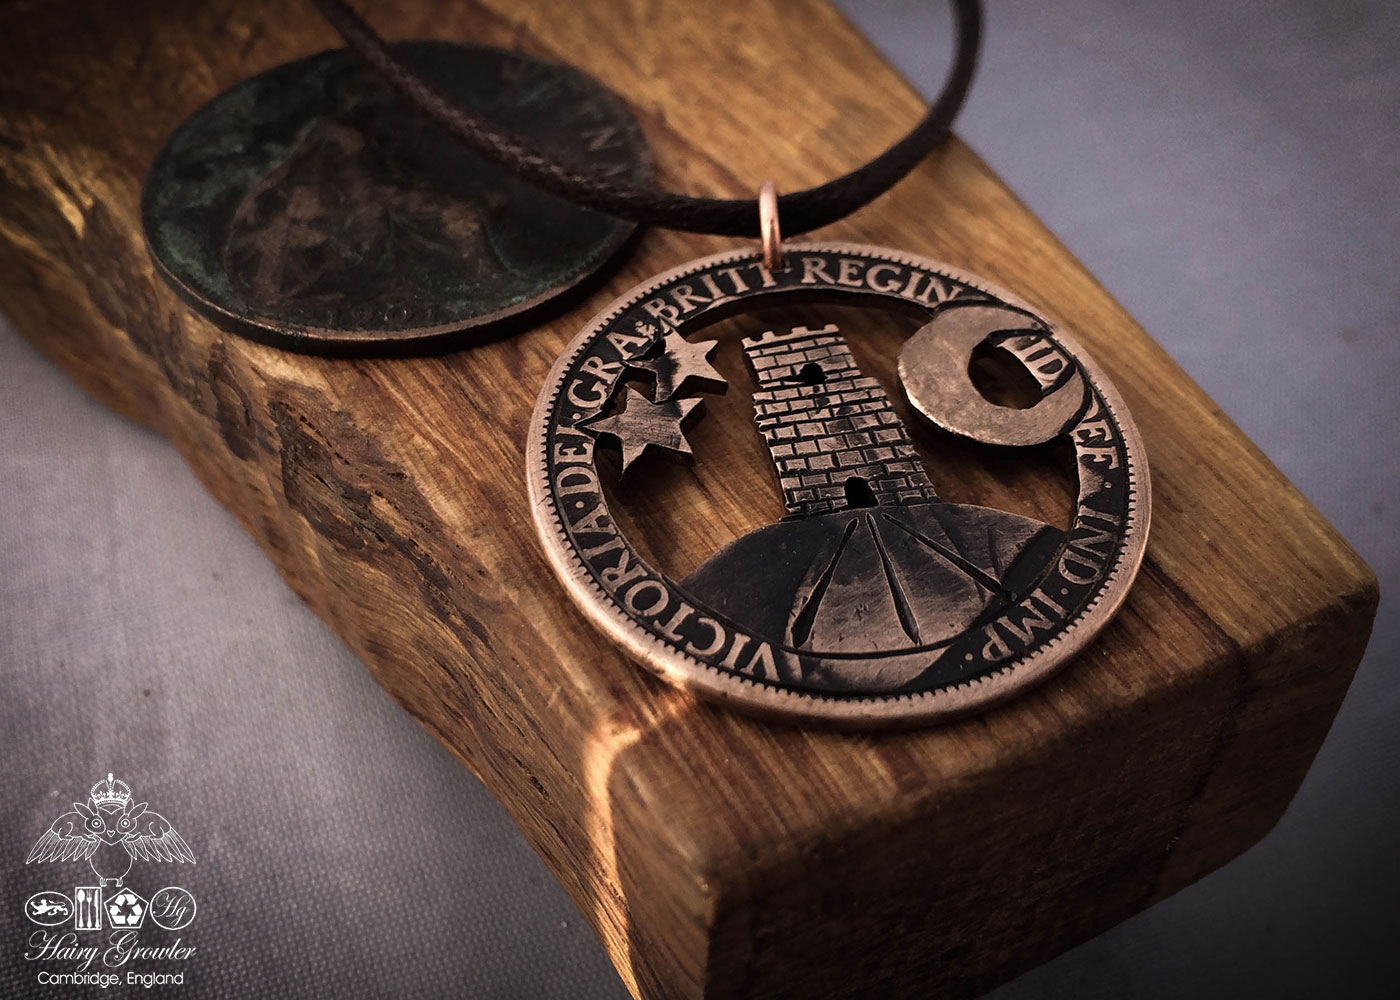 Handmade and repurposed Glastonbury Tor coin pendant necklace